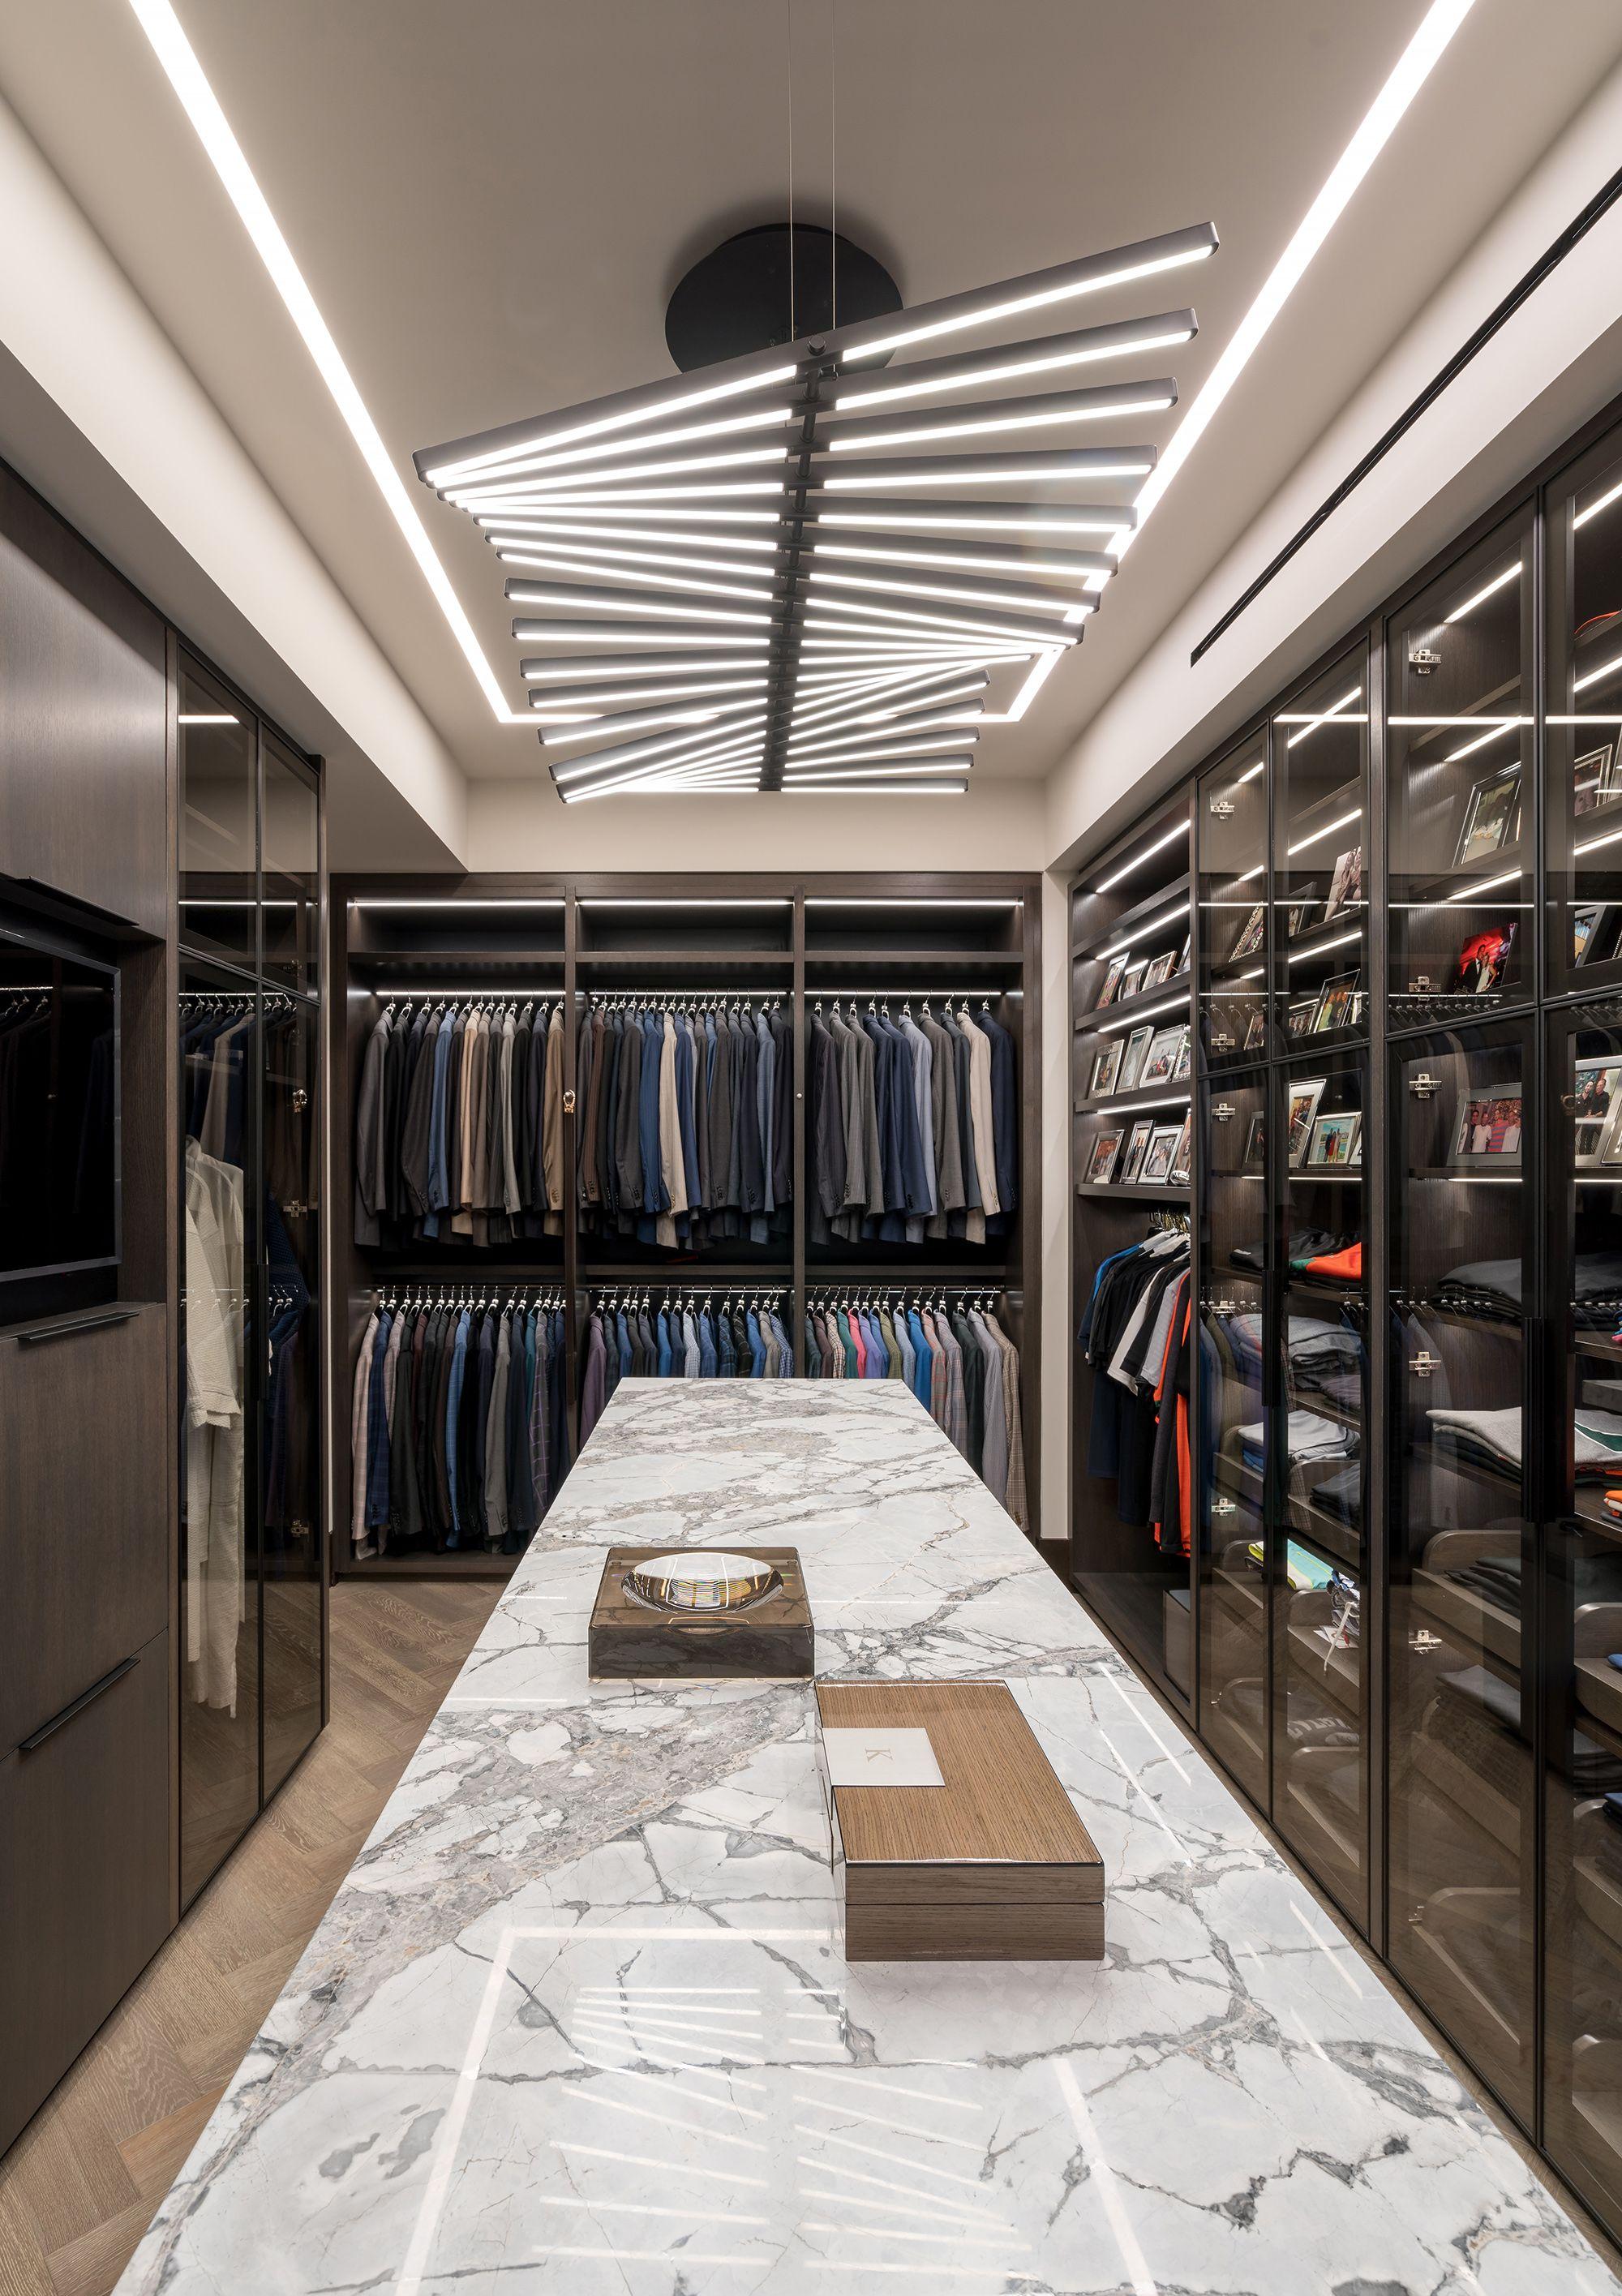 Image of: 20 Great Walk In Closet Ideas Stunning Large Custom Closet Designs